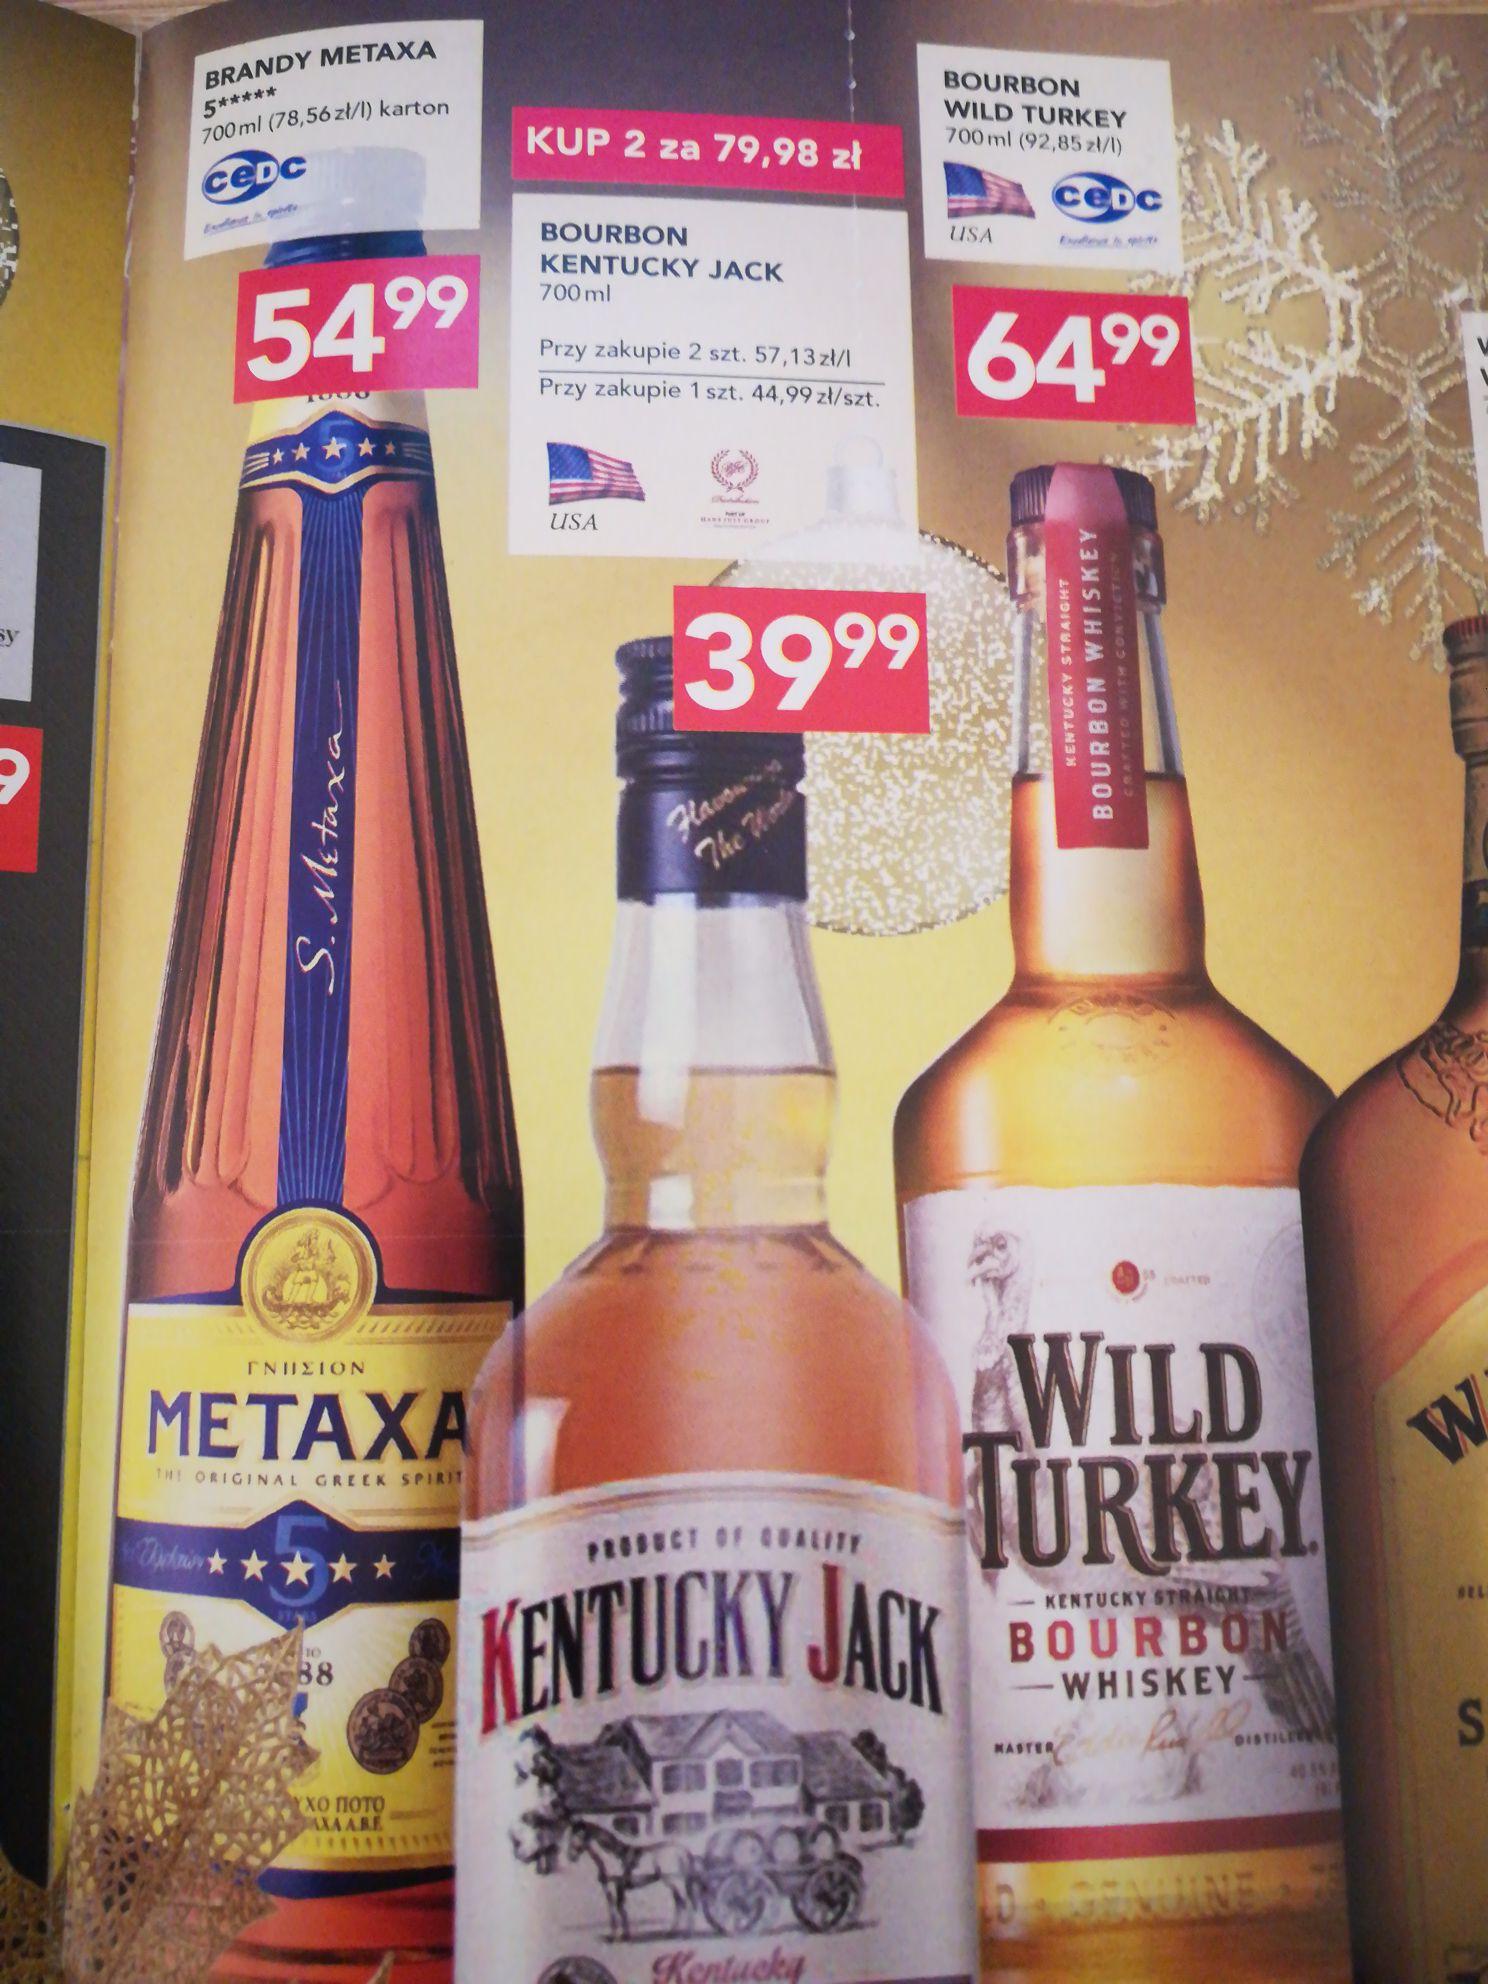 Bourbon Kentucky Jack 700 ml Stokrotka